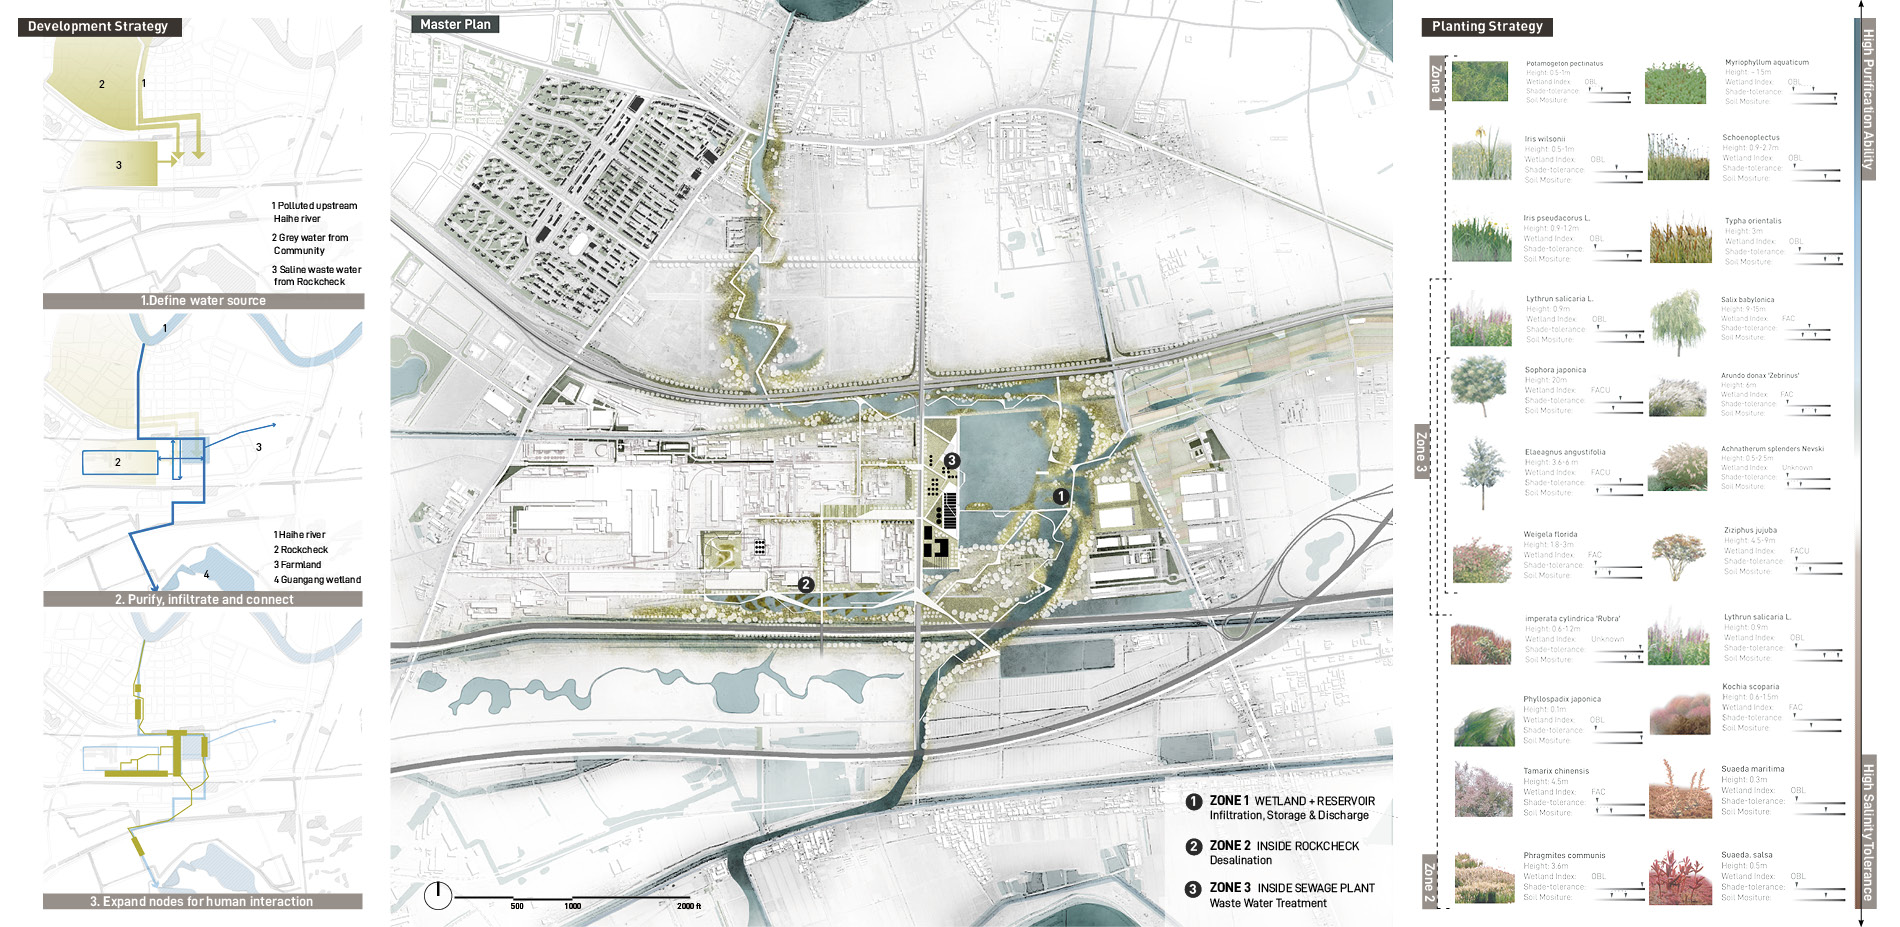 Blue Corridor as Industrial Community Armature: Master Plan